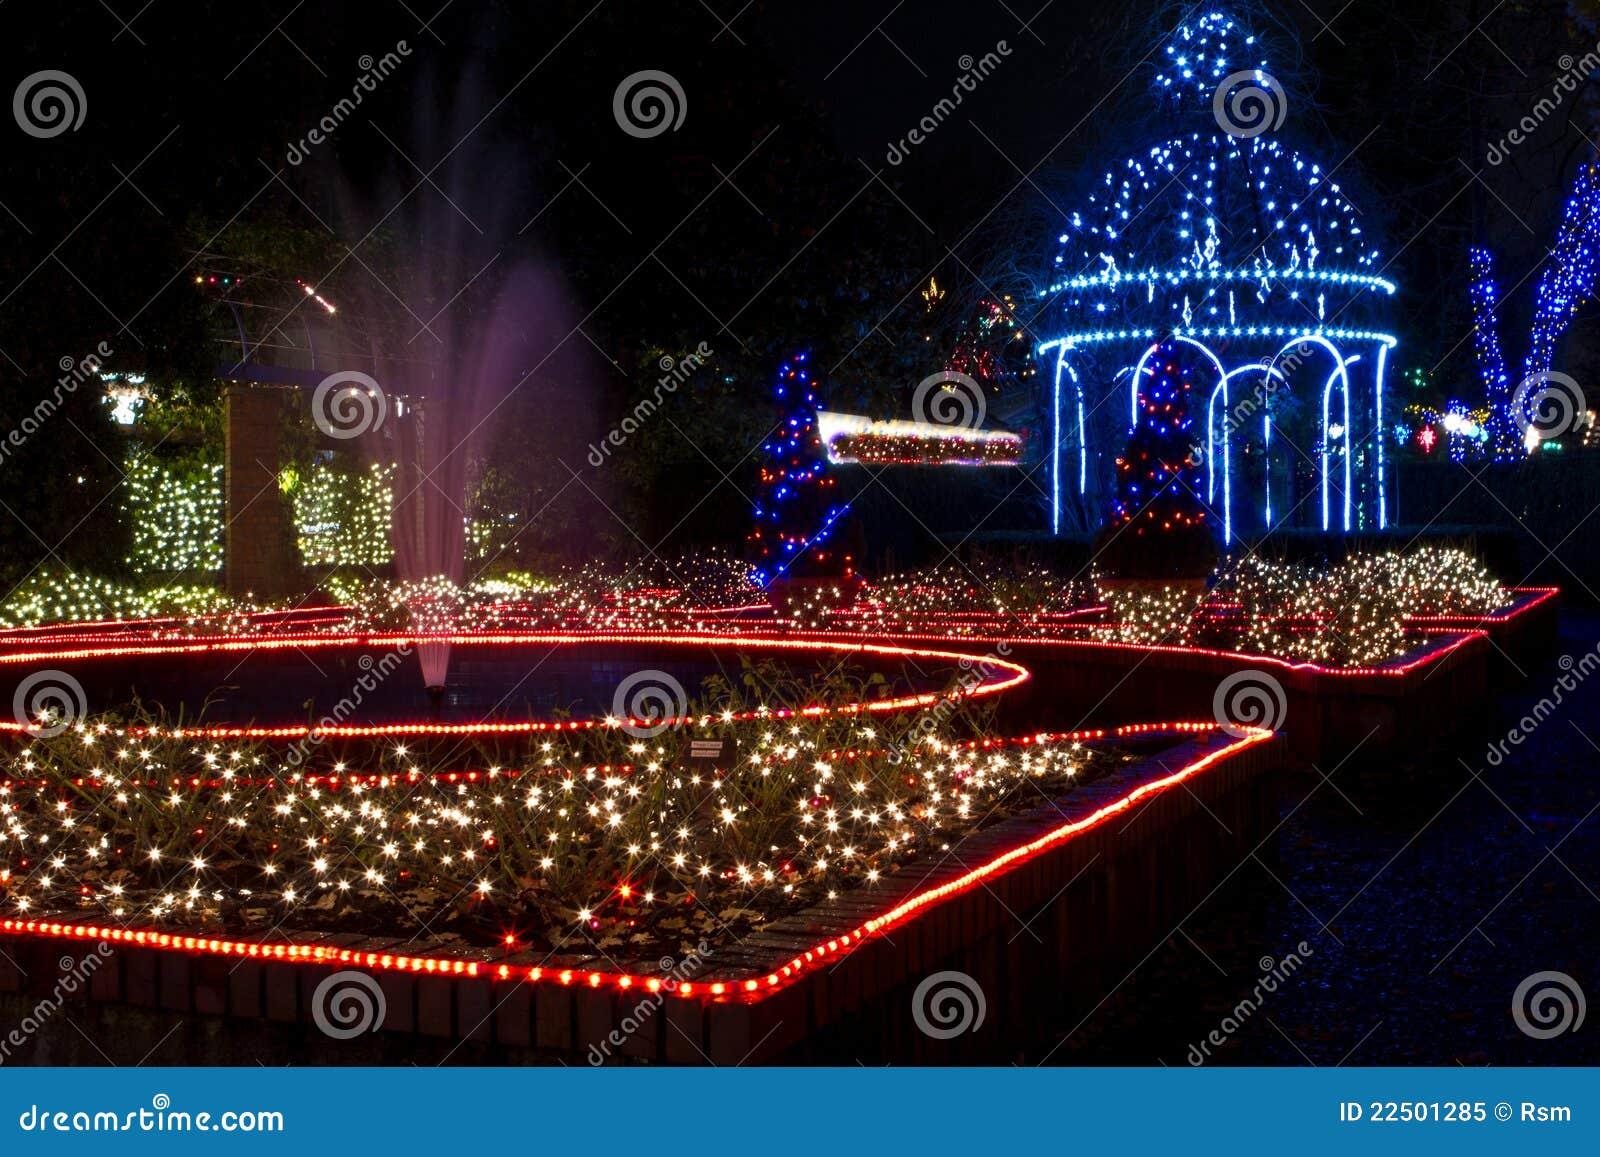 Christmas Gazebo And Fountain Royalty Free Stock Photo